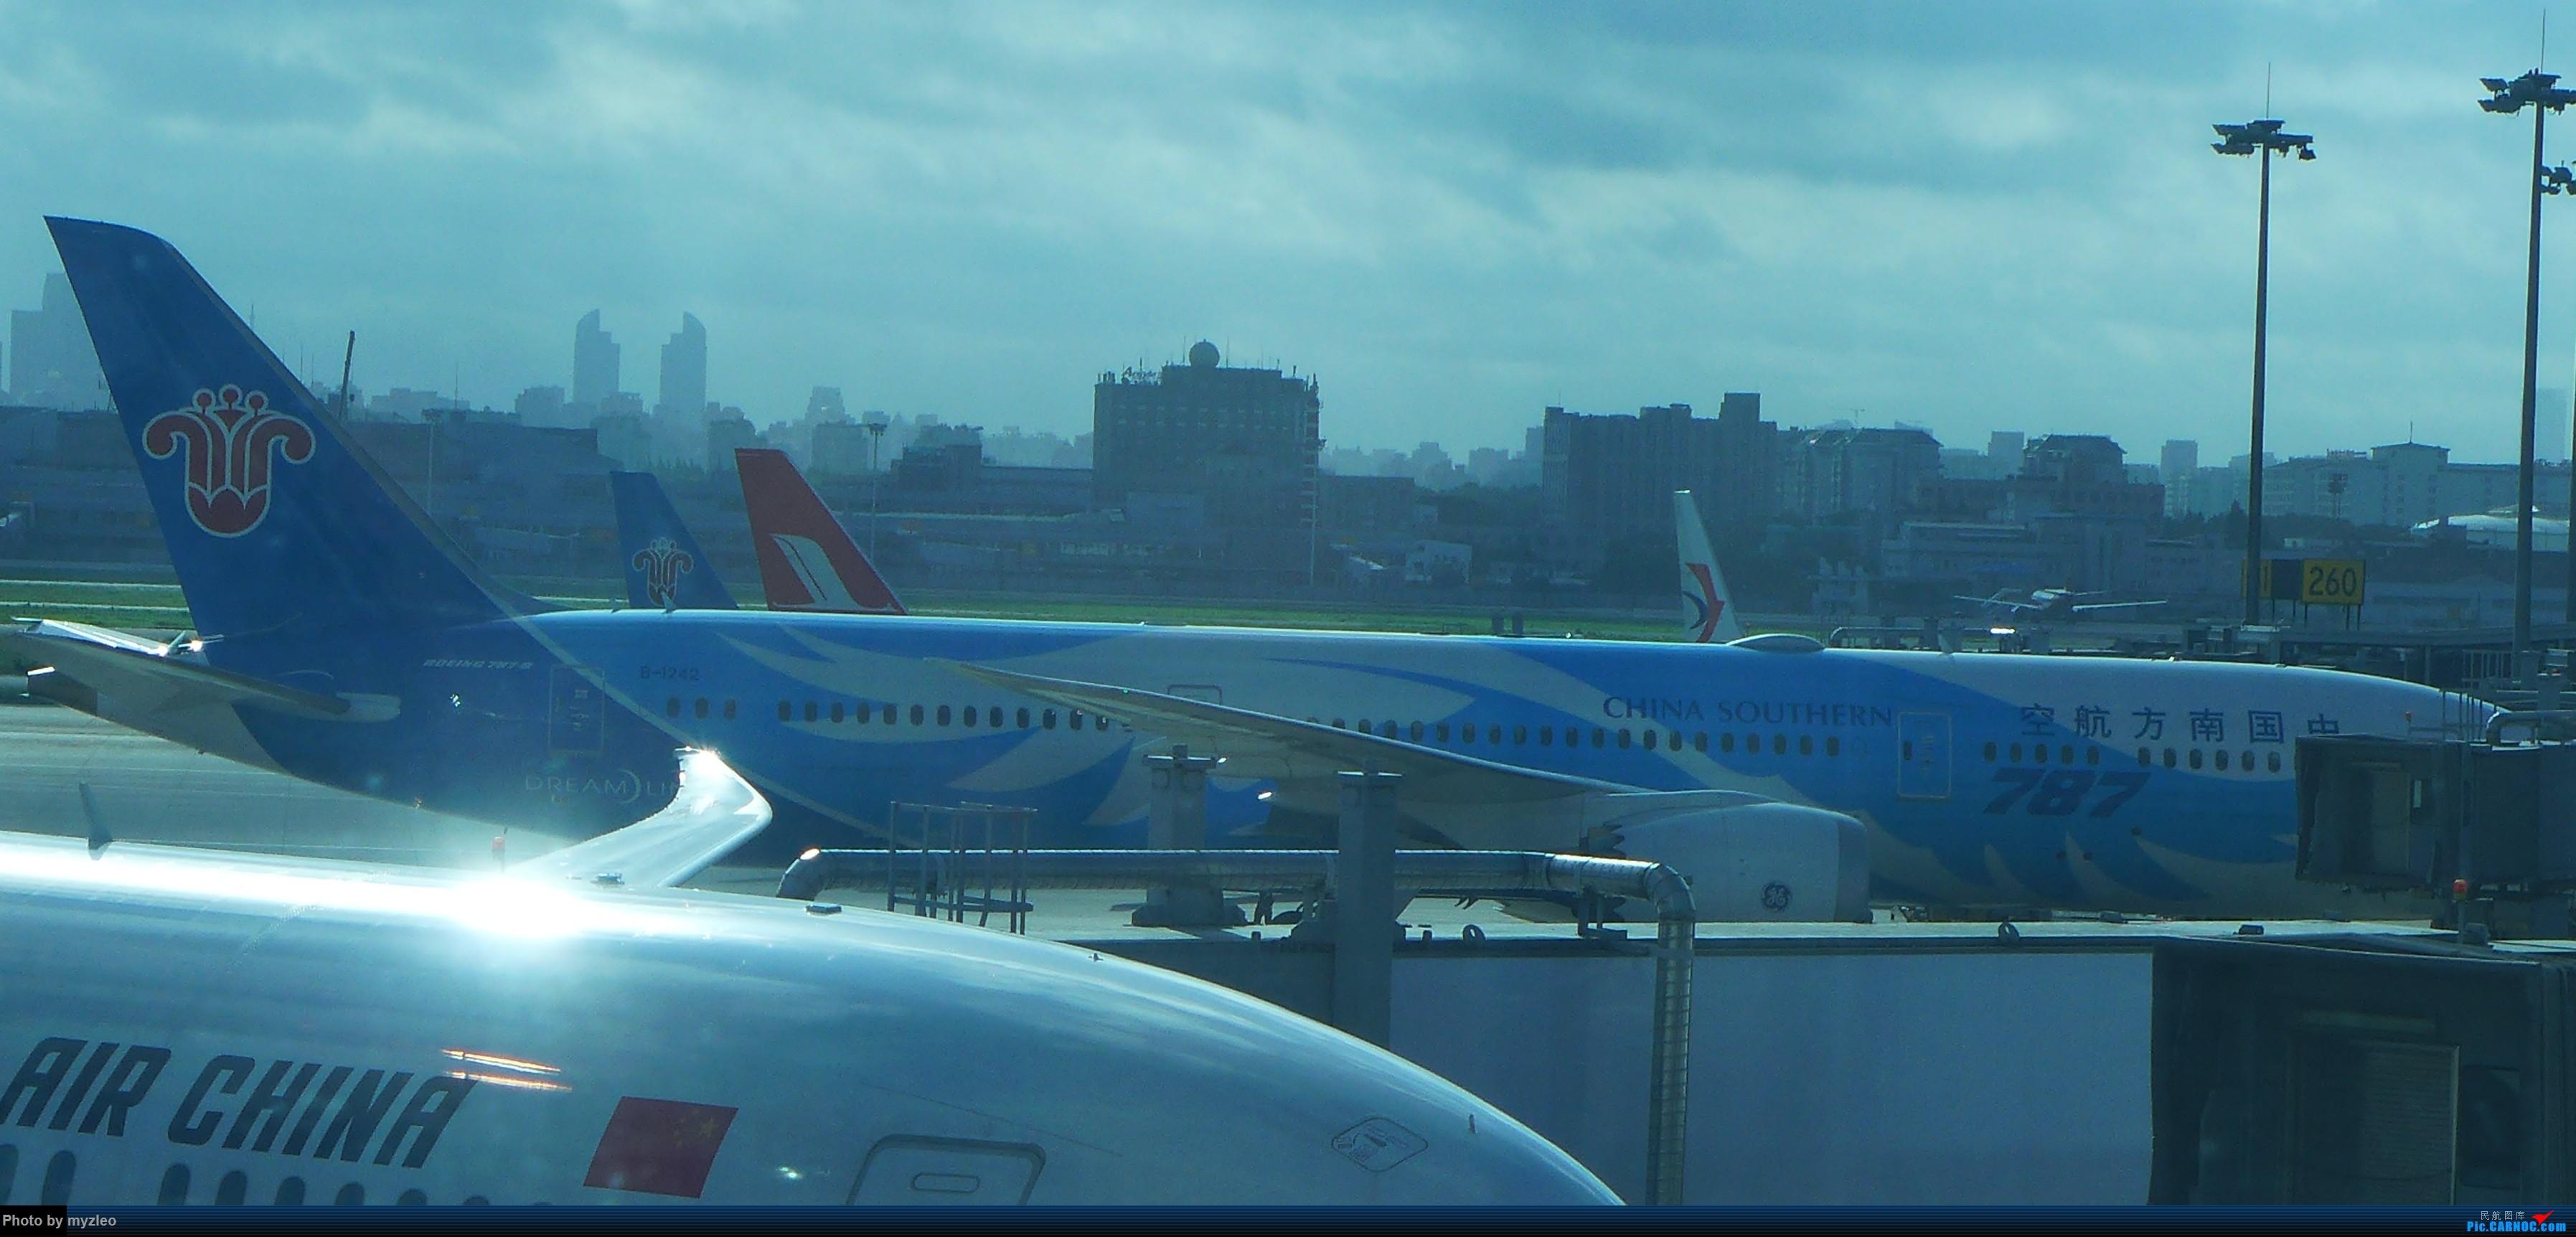 Re:[原创]【myzleo的游记2.1】昆洱风光(1)——SHA-KMG上航商务舱再体验+人在昆明 BOEING 787-9 B-1242 中国上海虹桥国际机场